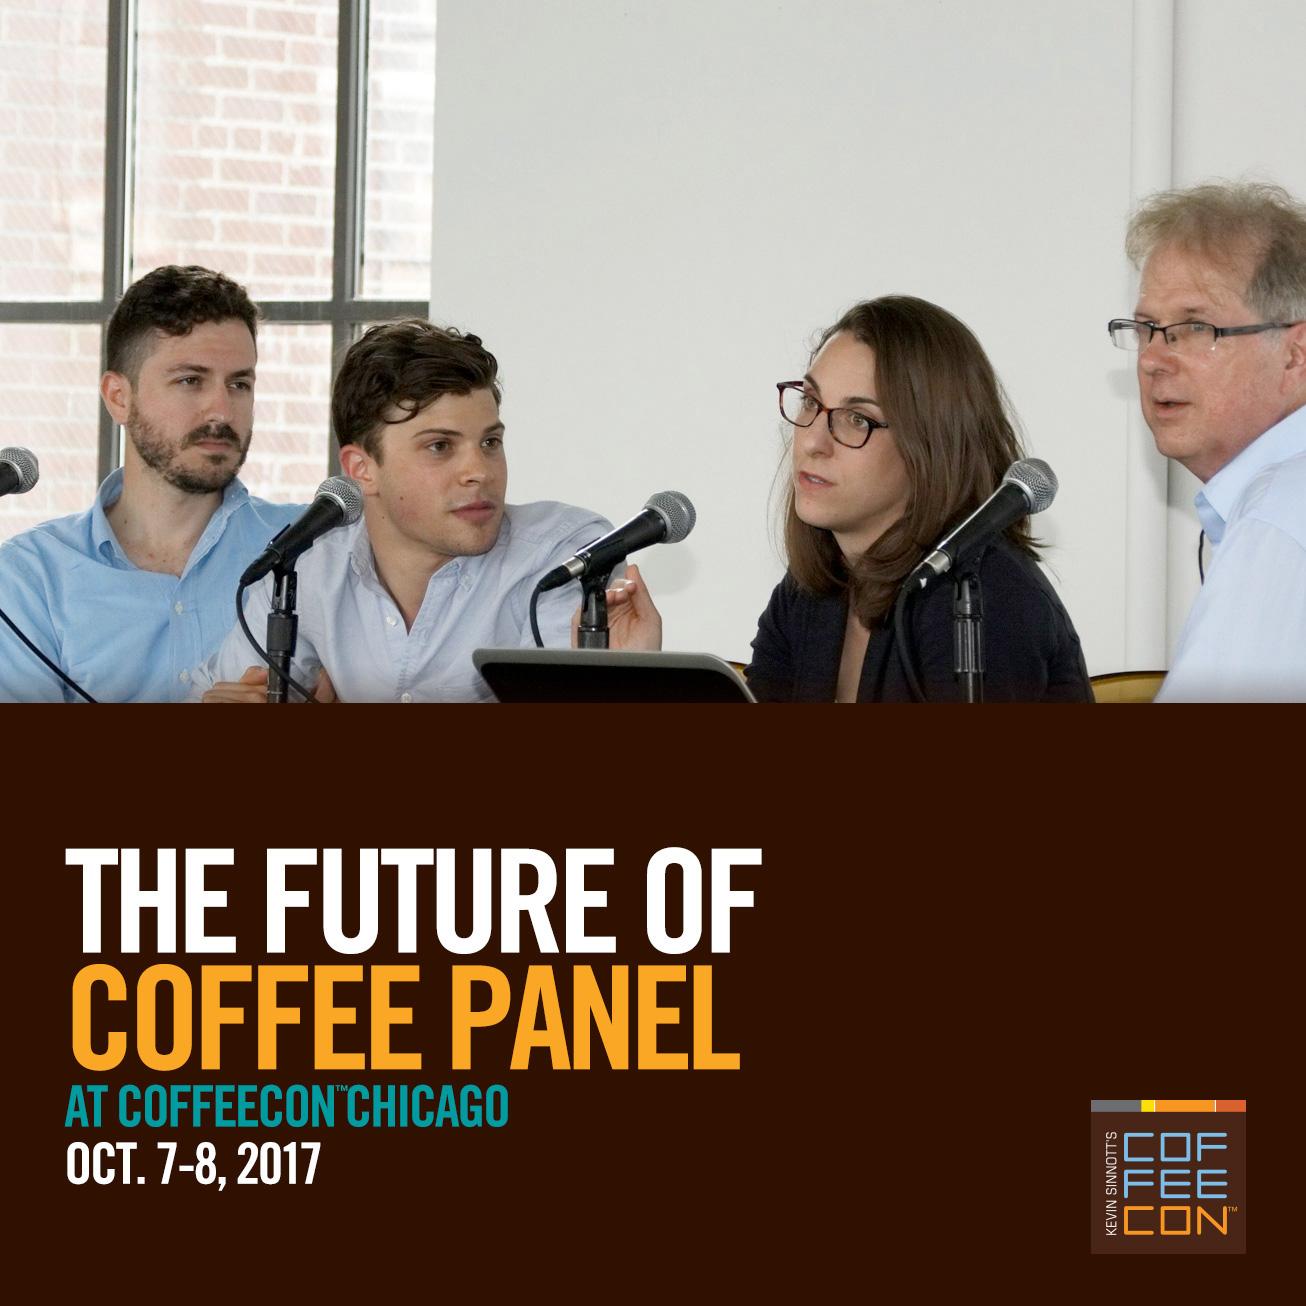 The Future of Coffee Panel at CoffeeConChi 2017